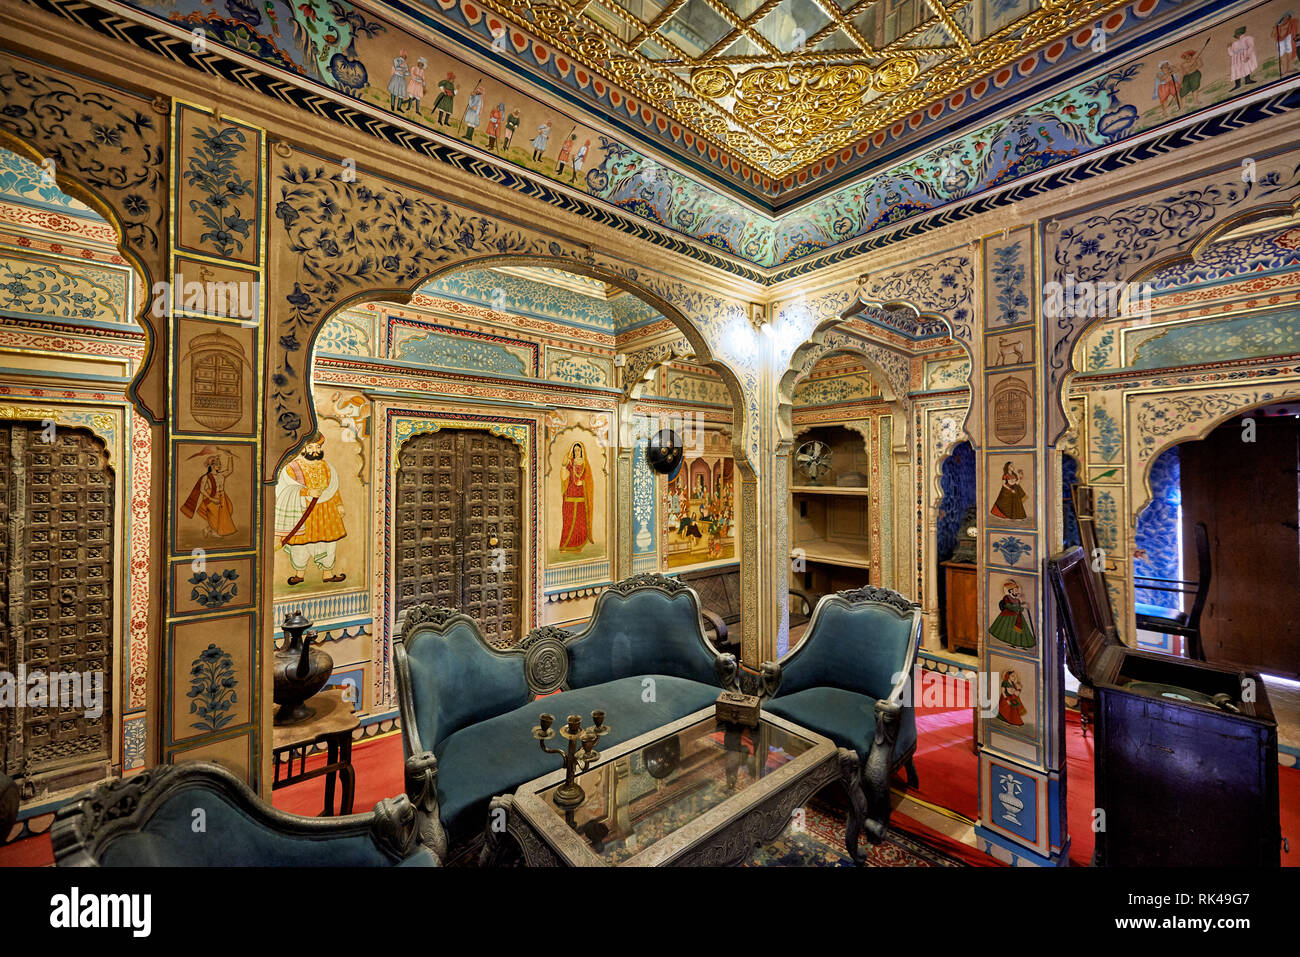 interior shot of ornated and decorated Kothari Patwa Haveli, Jaisalmer, Rajasthan, India - Stock Image